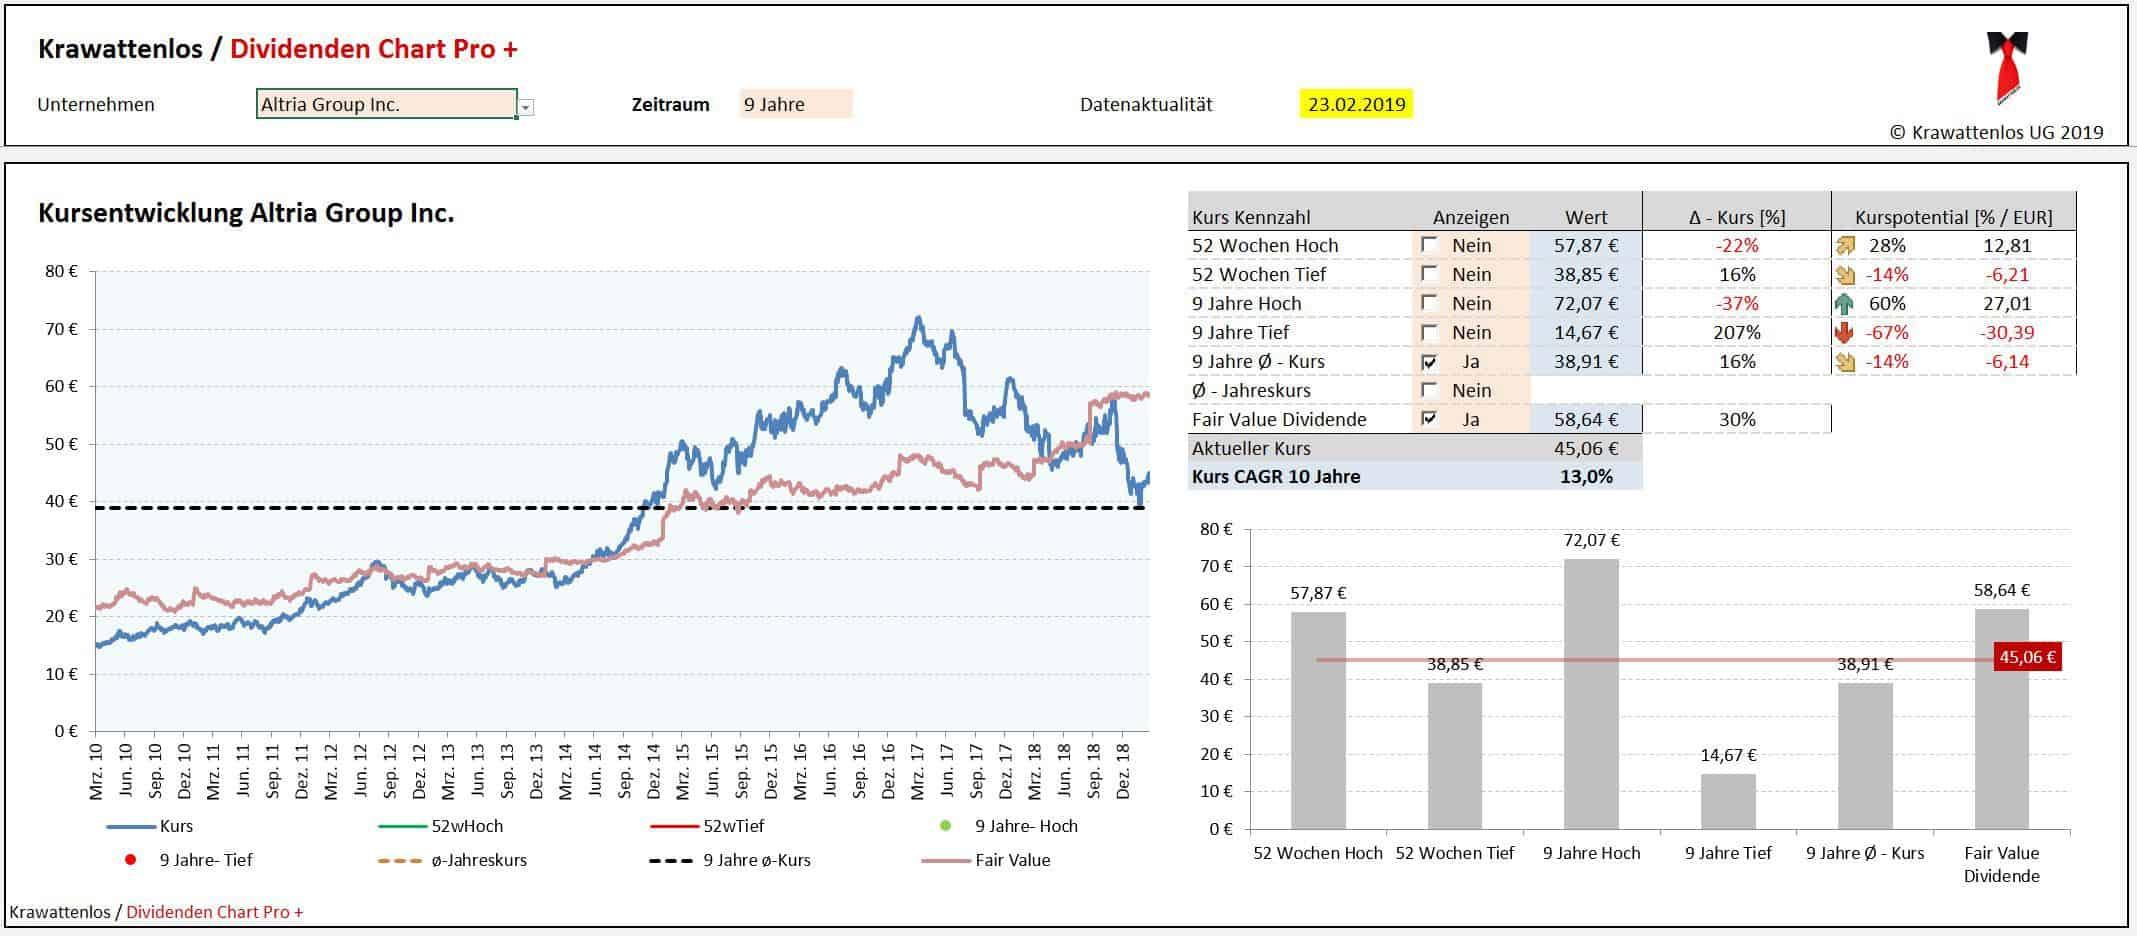 Altria Group - Fair Value Dividende